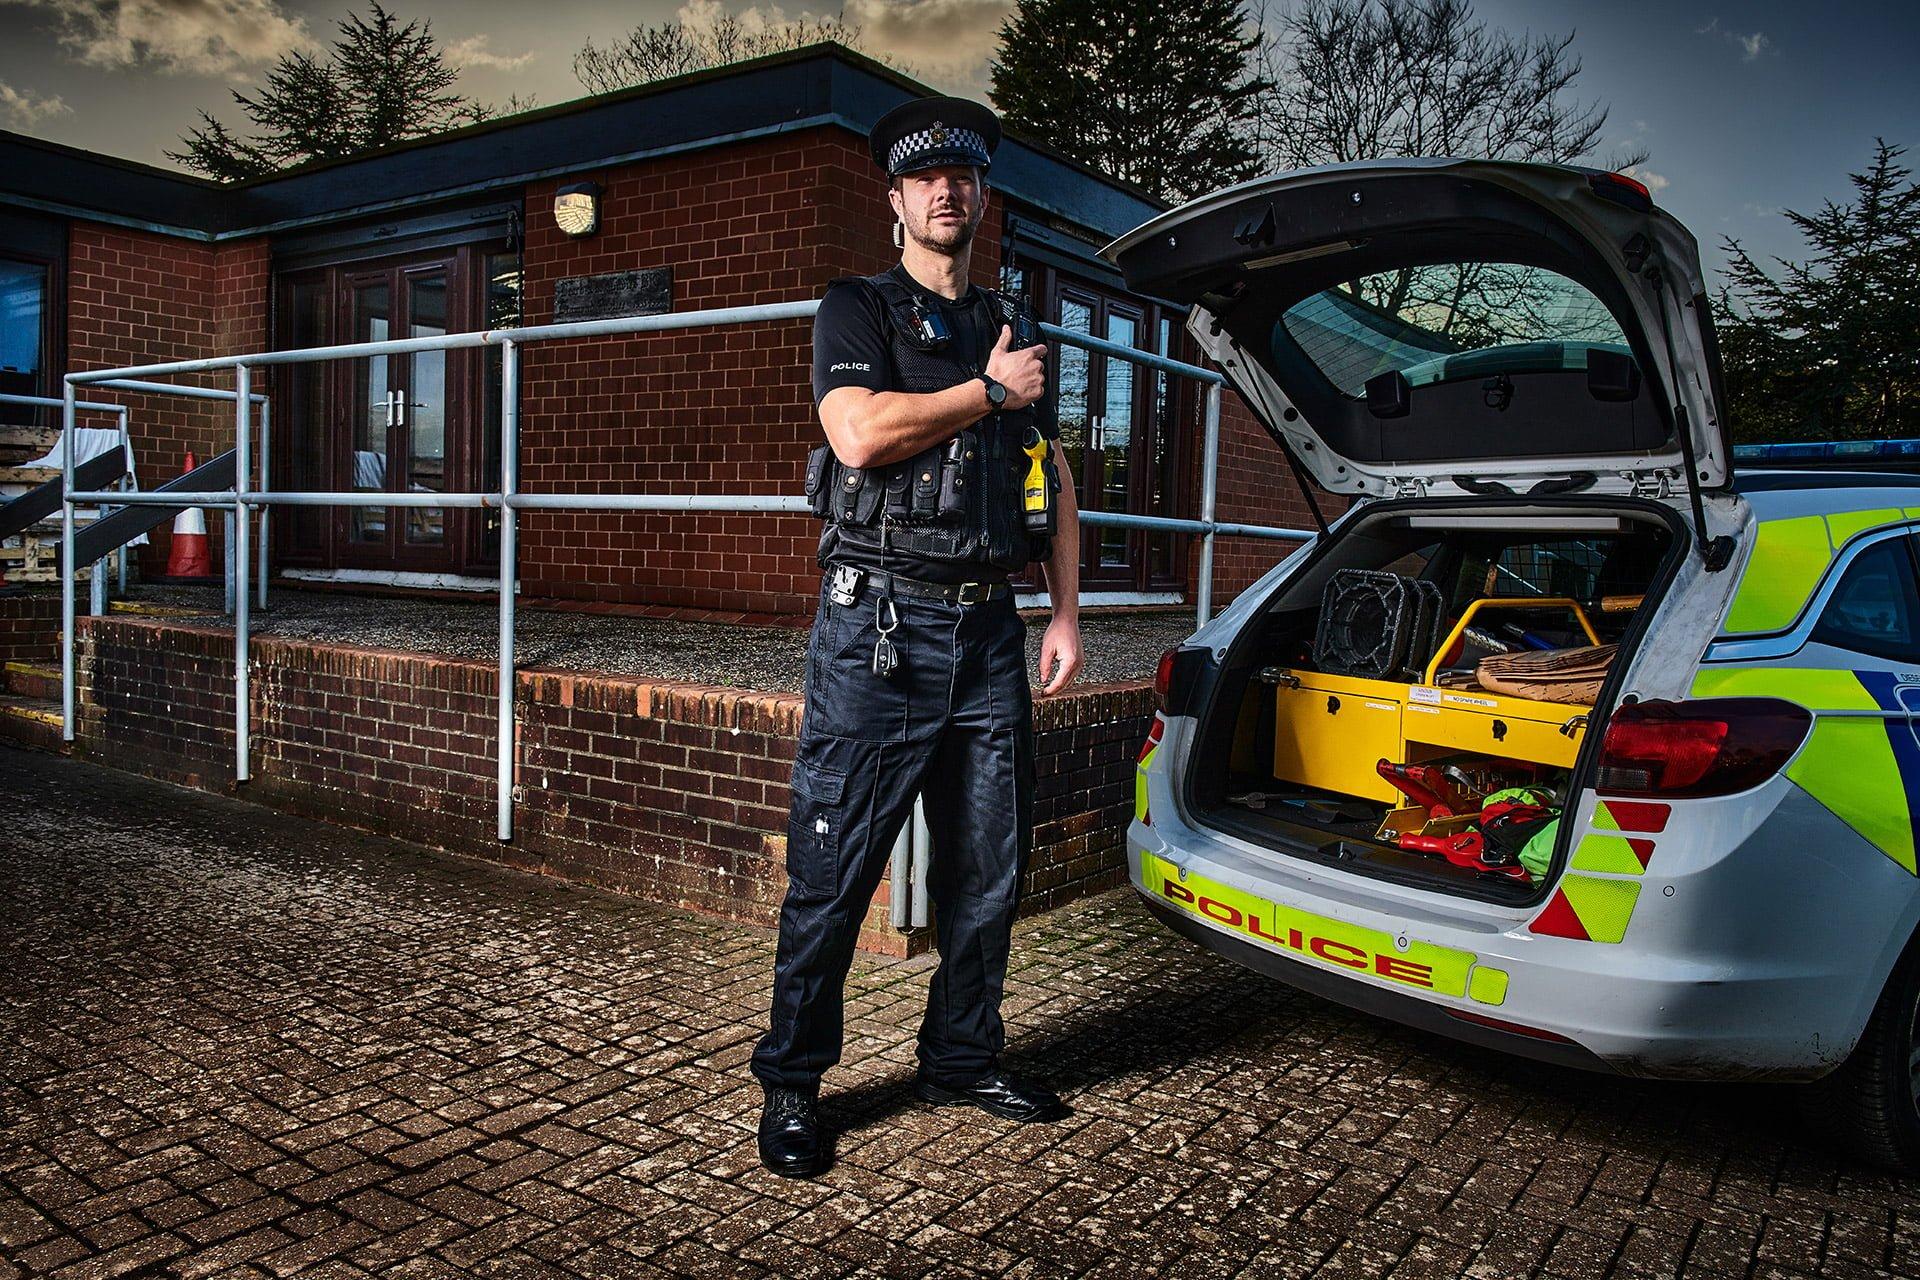 police_photographers_UK